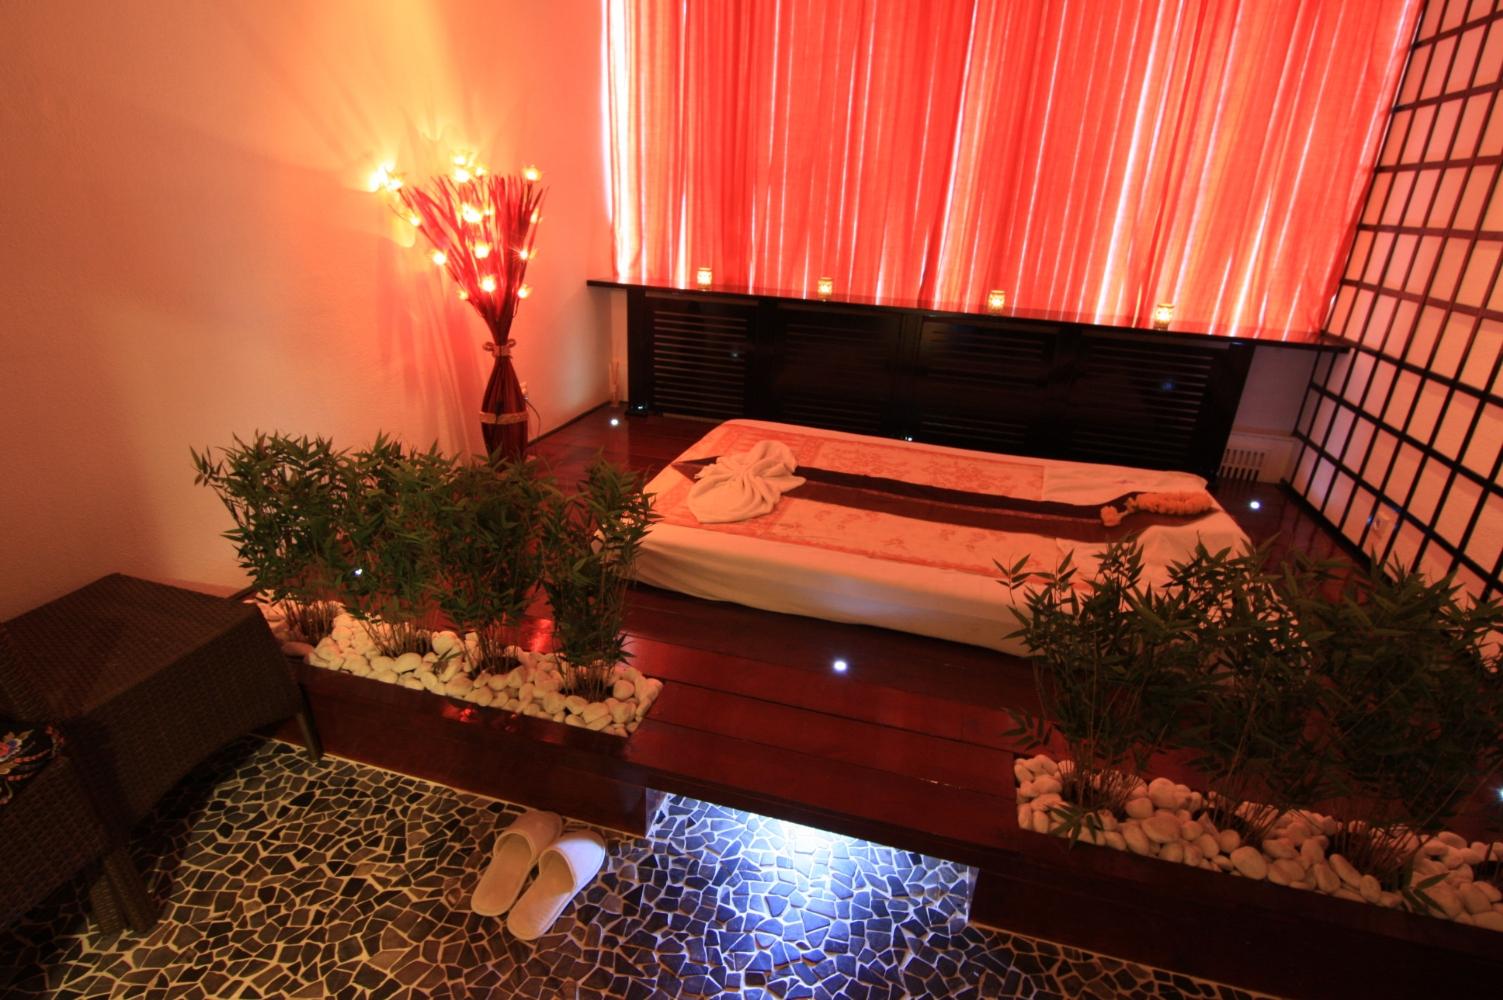 Massage in kamer 39 sukho thai 39 nijmegen 1 persoons manadrin spa - Spa kamer ...